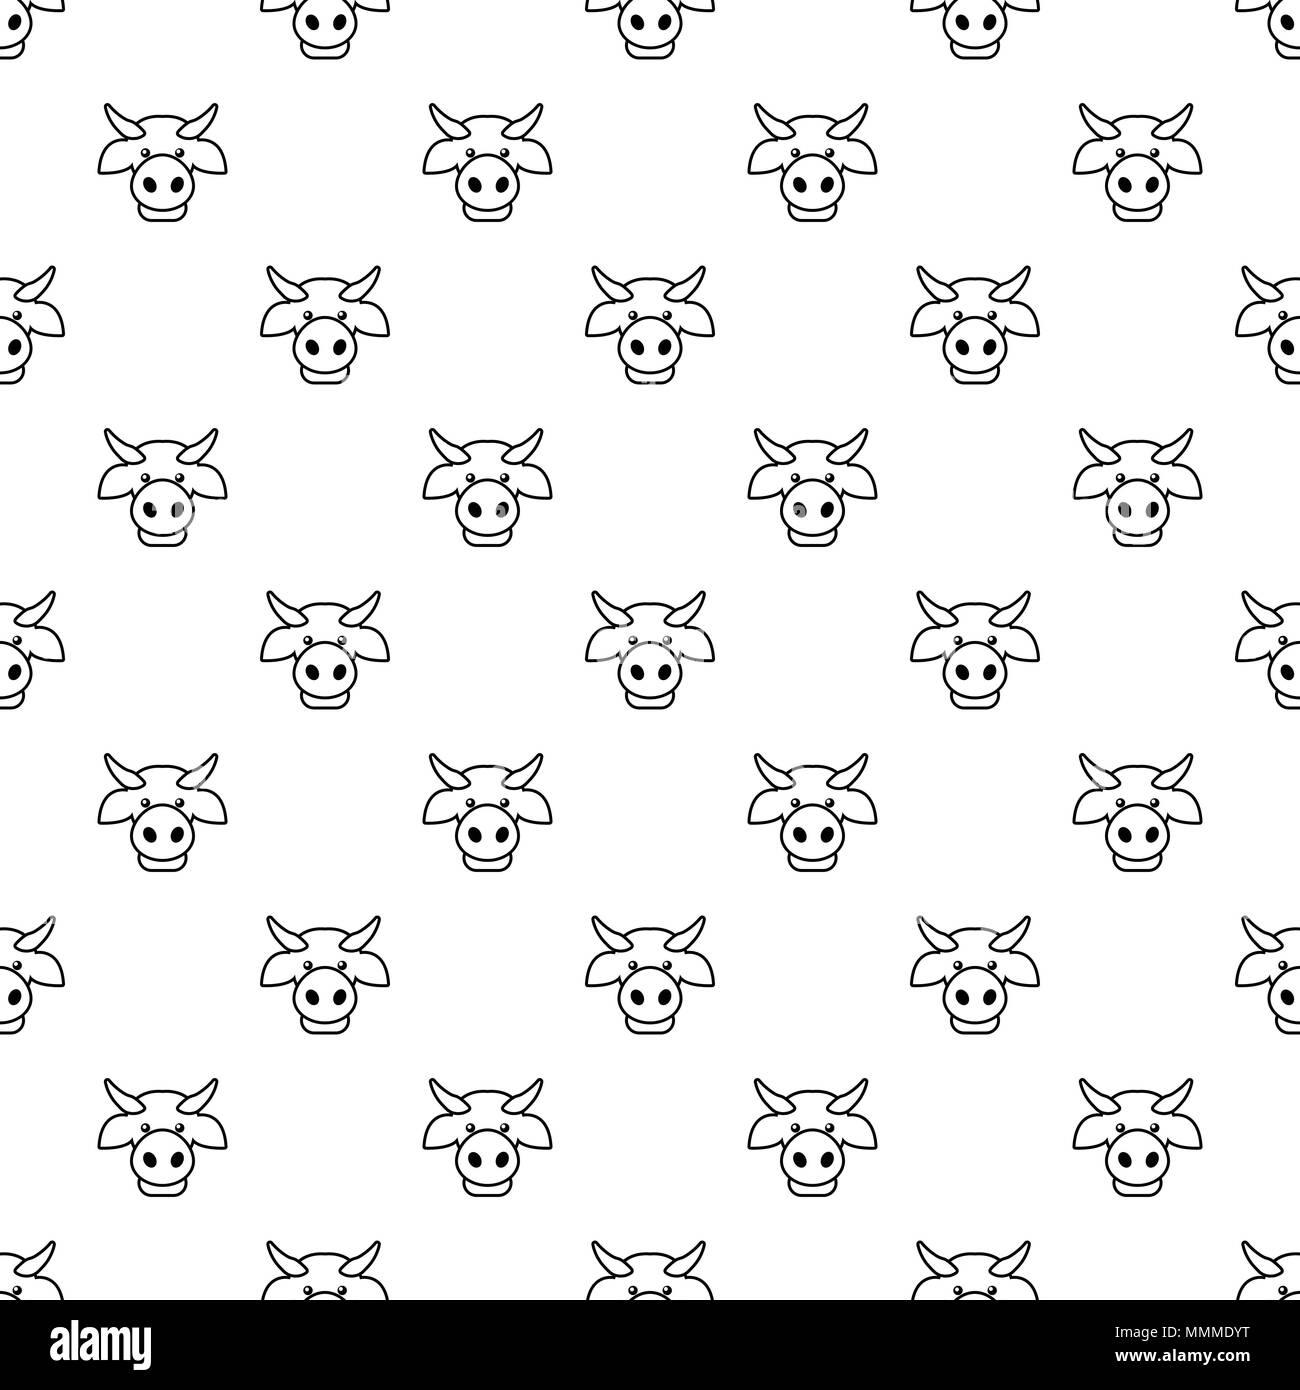 cow head pattern vector seamless stock vector art illustration